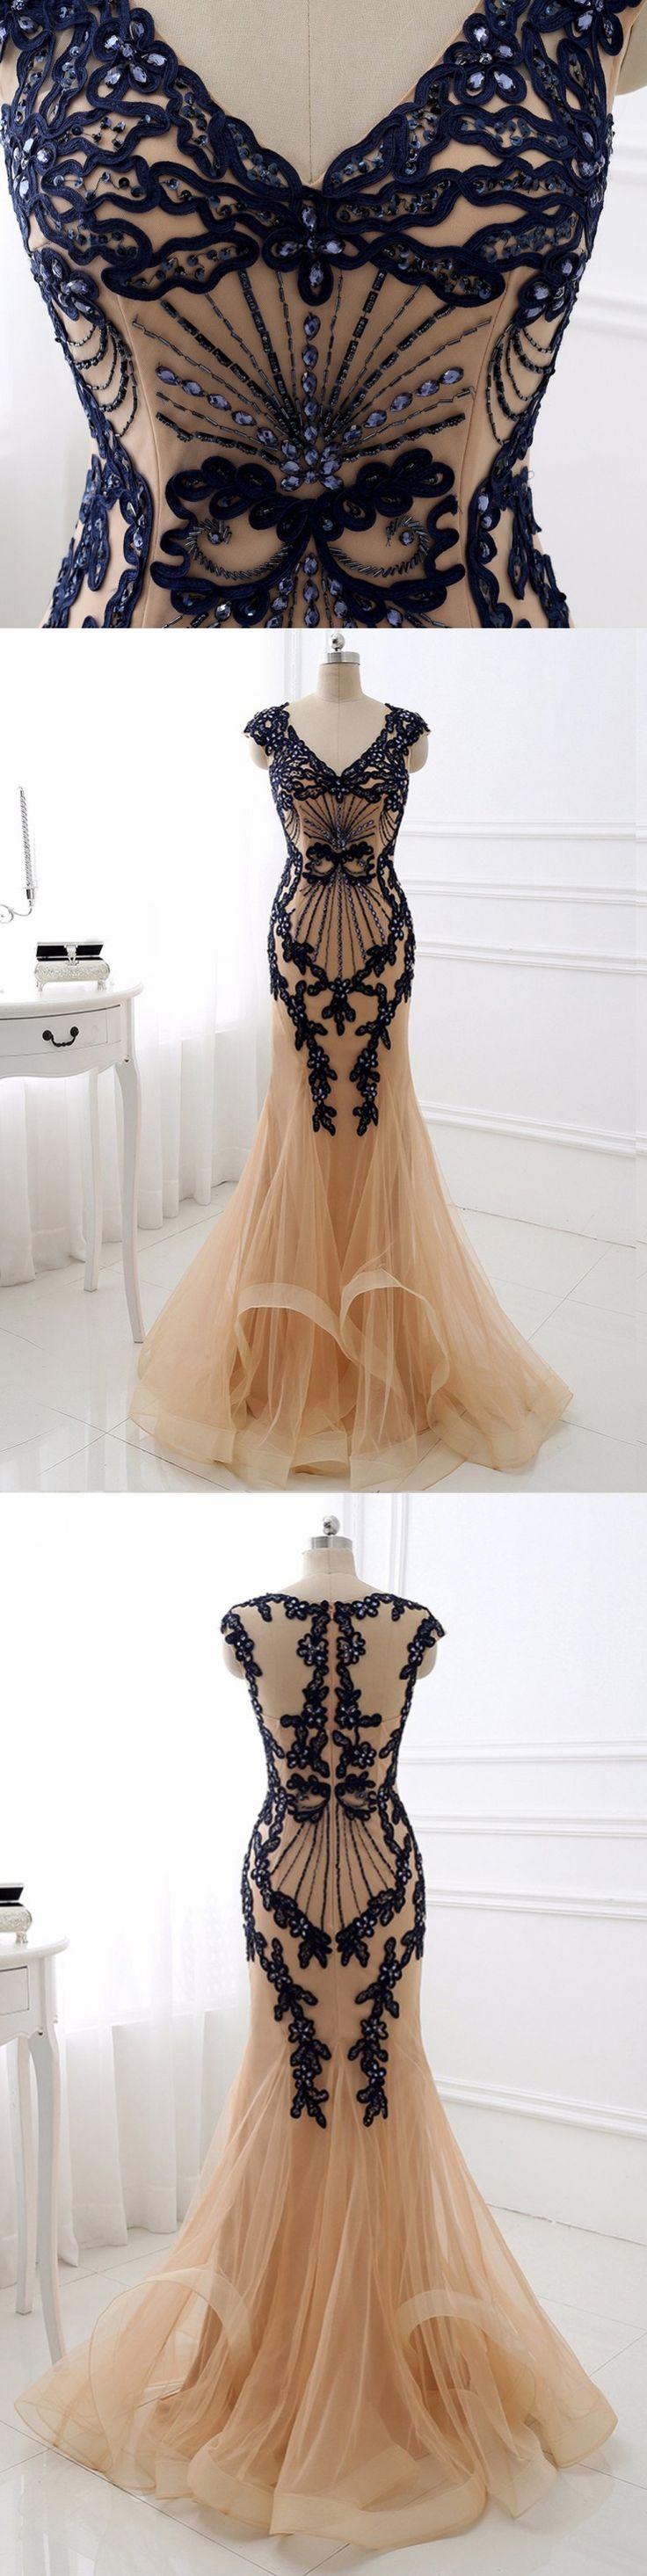 Sexy Prom Dresses Trumpet/Mermaid V-neck Rhinestone Prom Dress/Evening Dress JKL373 #annapromdress #prom #promdress #evening #eveningdress #dance #longdress #longpromdress #fashion #style #dress